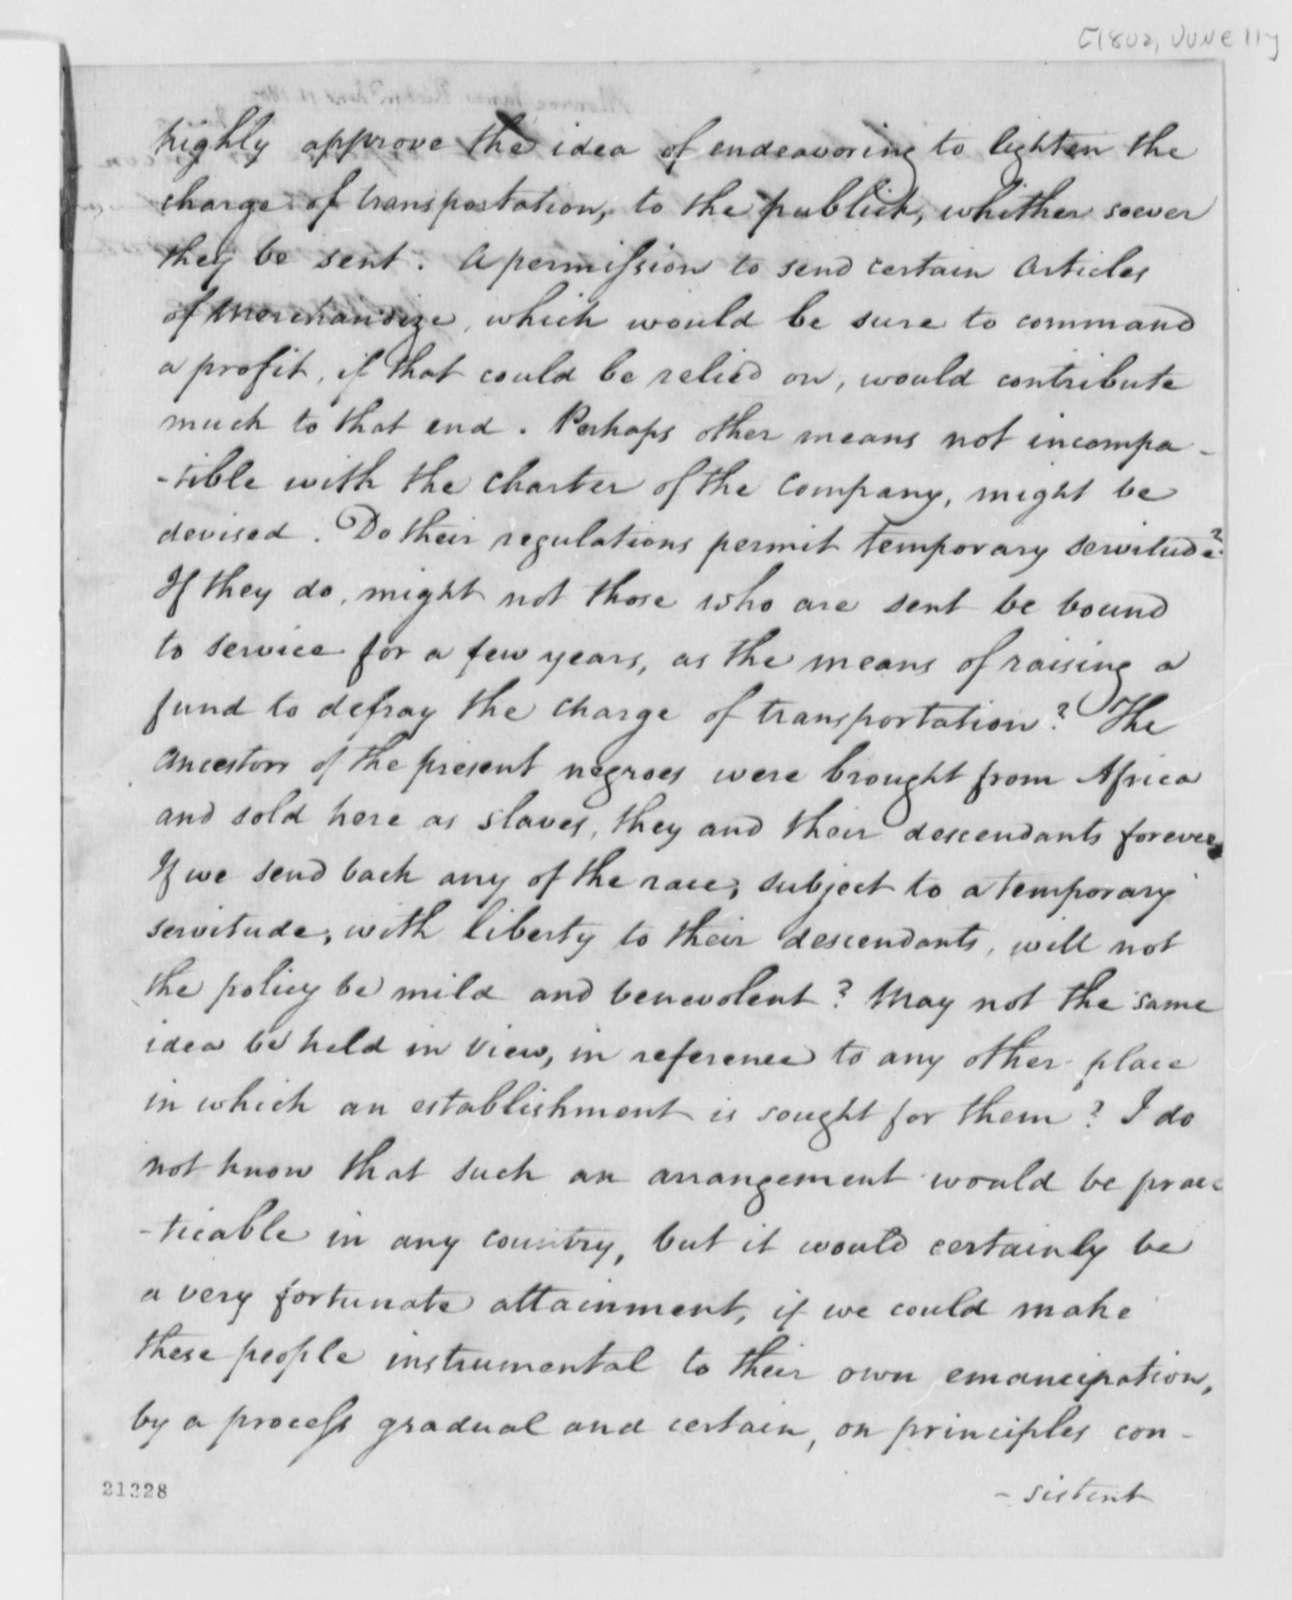 James Monroe to Thomas Jefferson, June 11, 1802